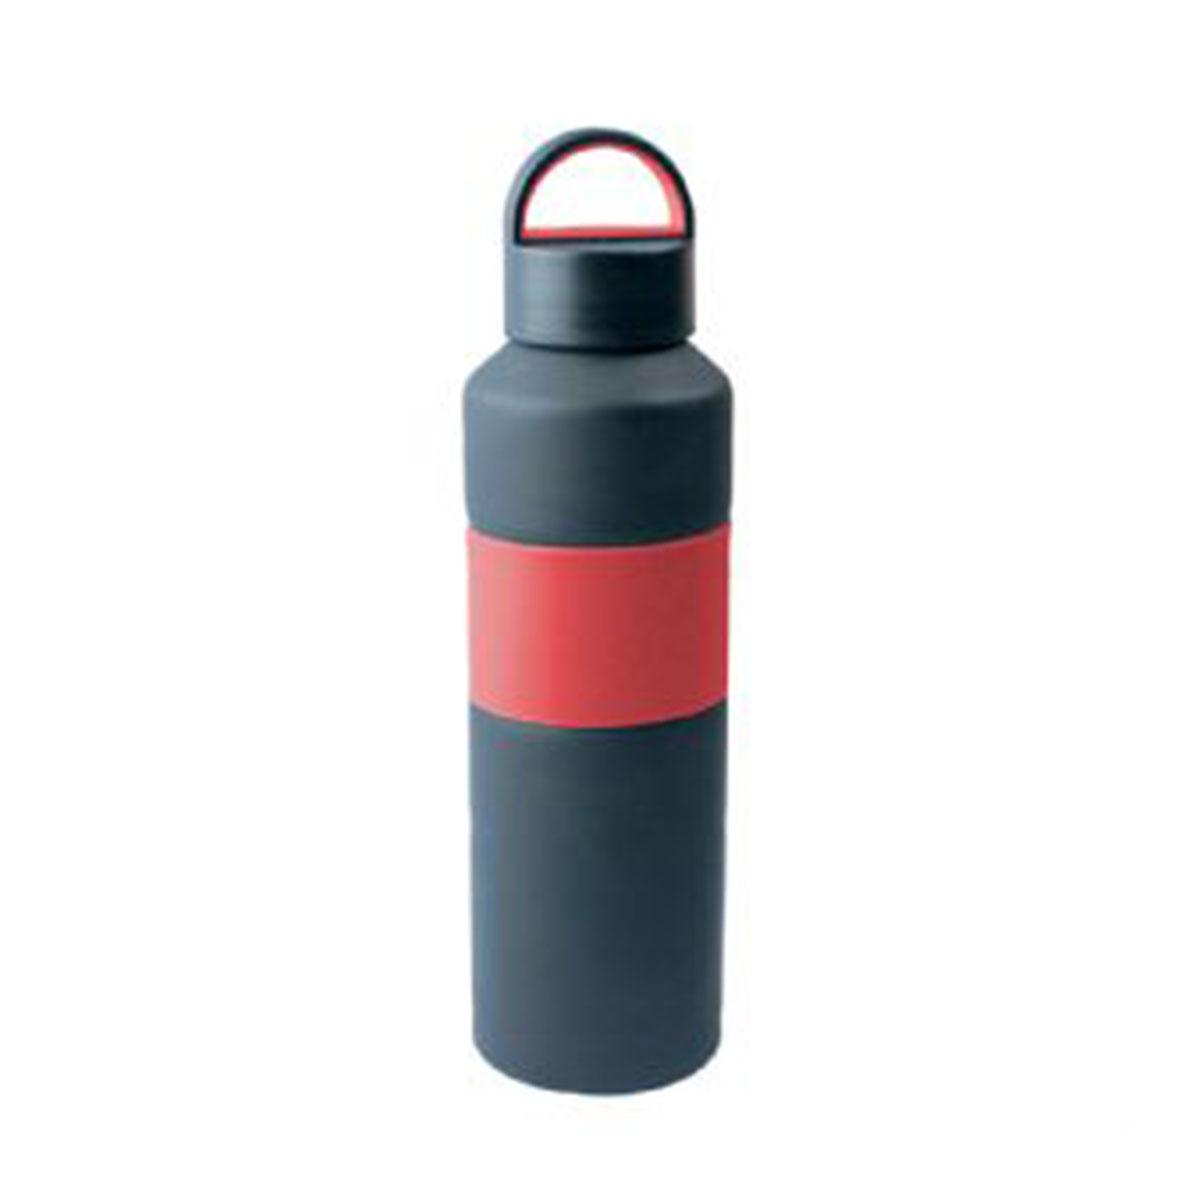 The Grip Drink Bottle-Red/Black